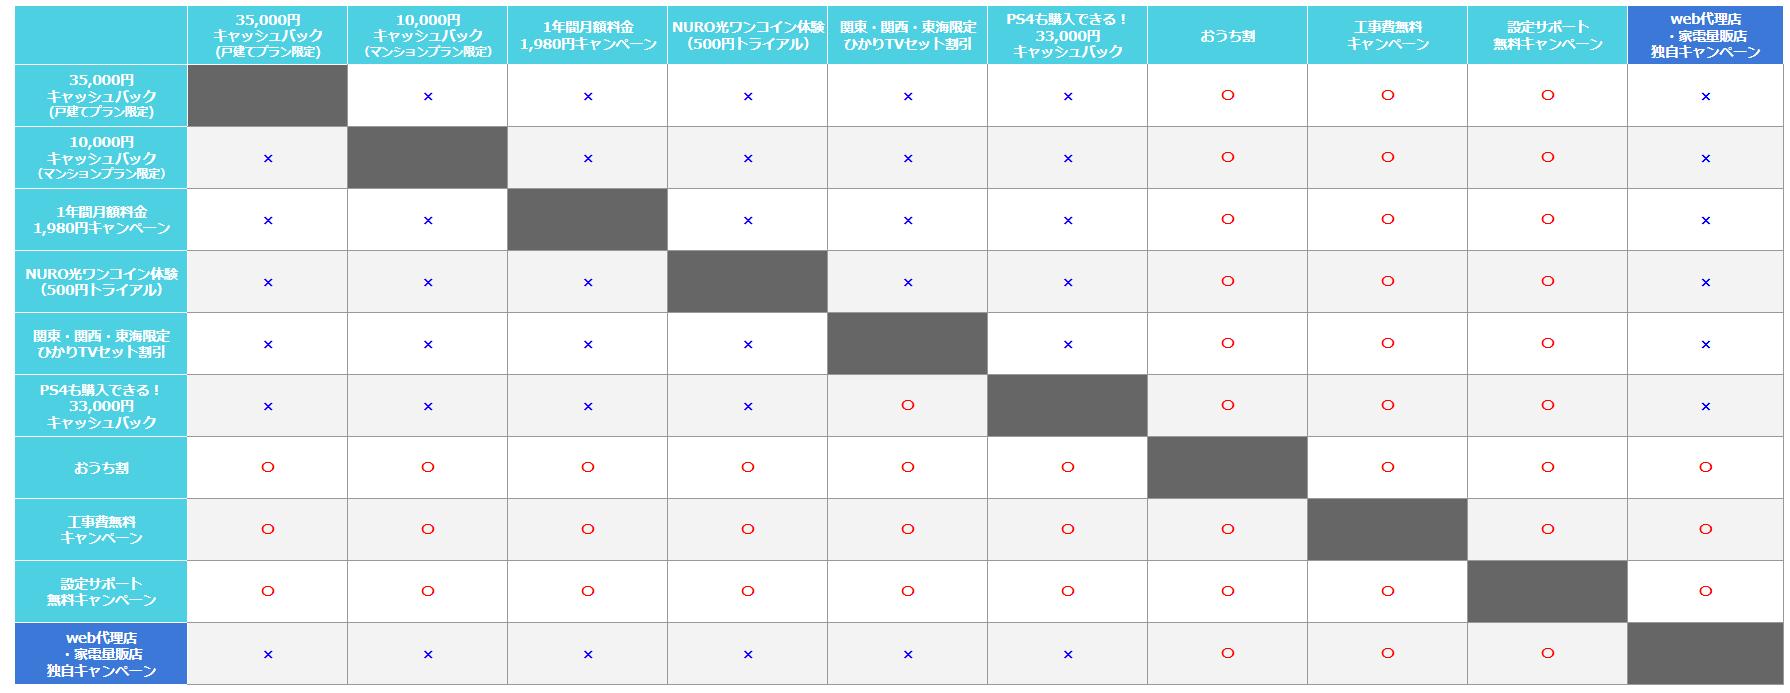 NURO光キャッシュバック 併用比較表